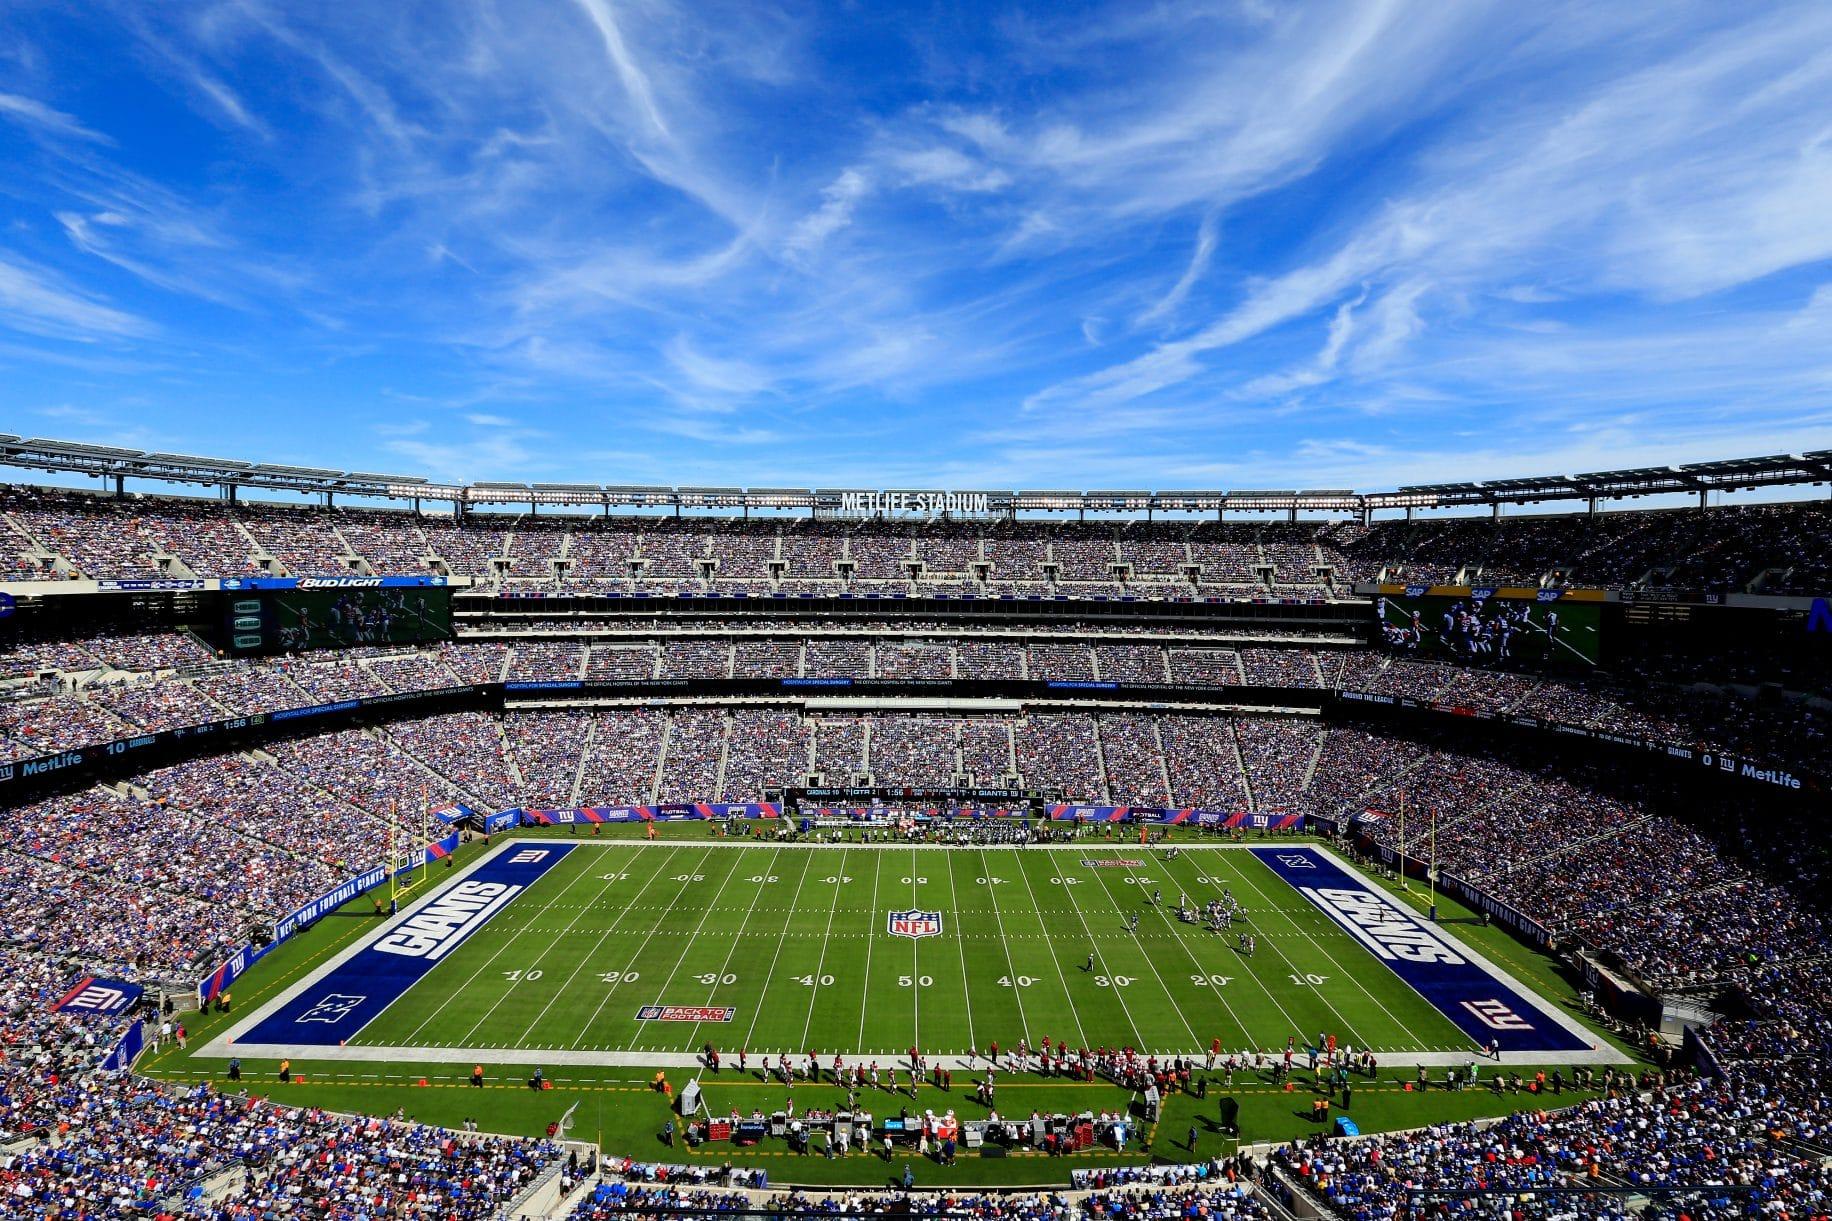 New York Giants, Metlife Stadium